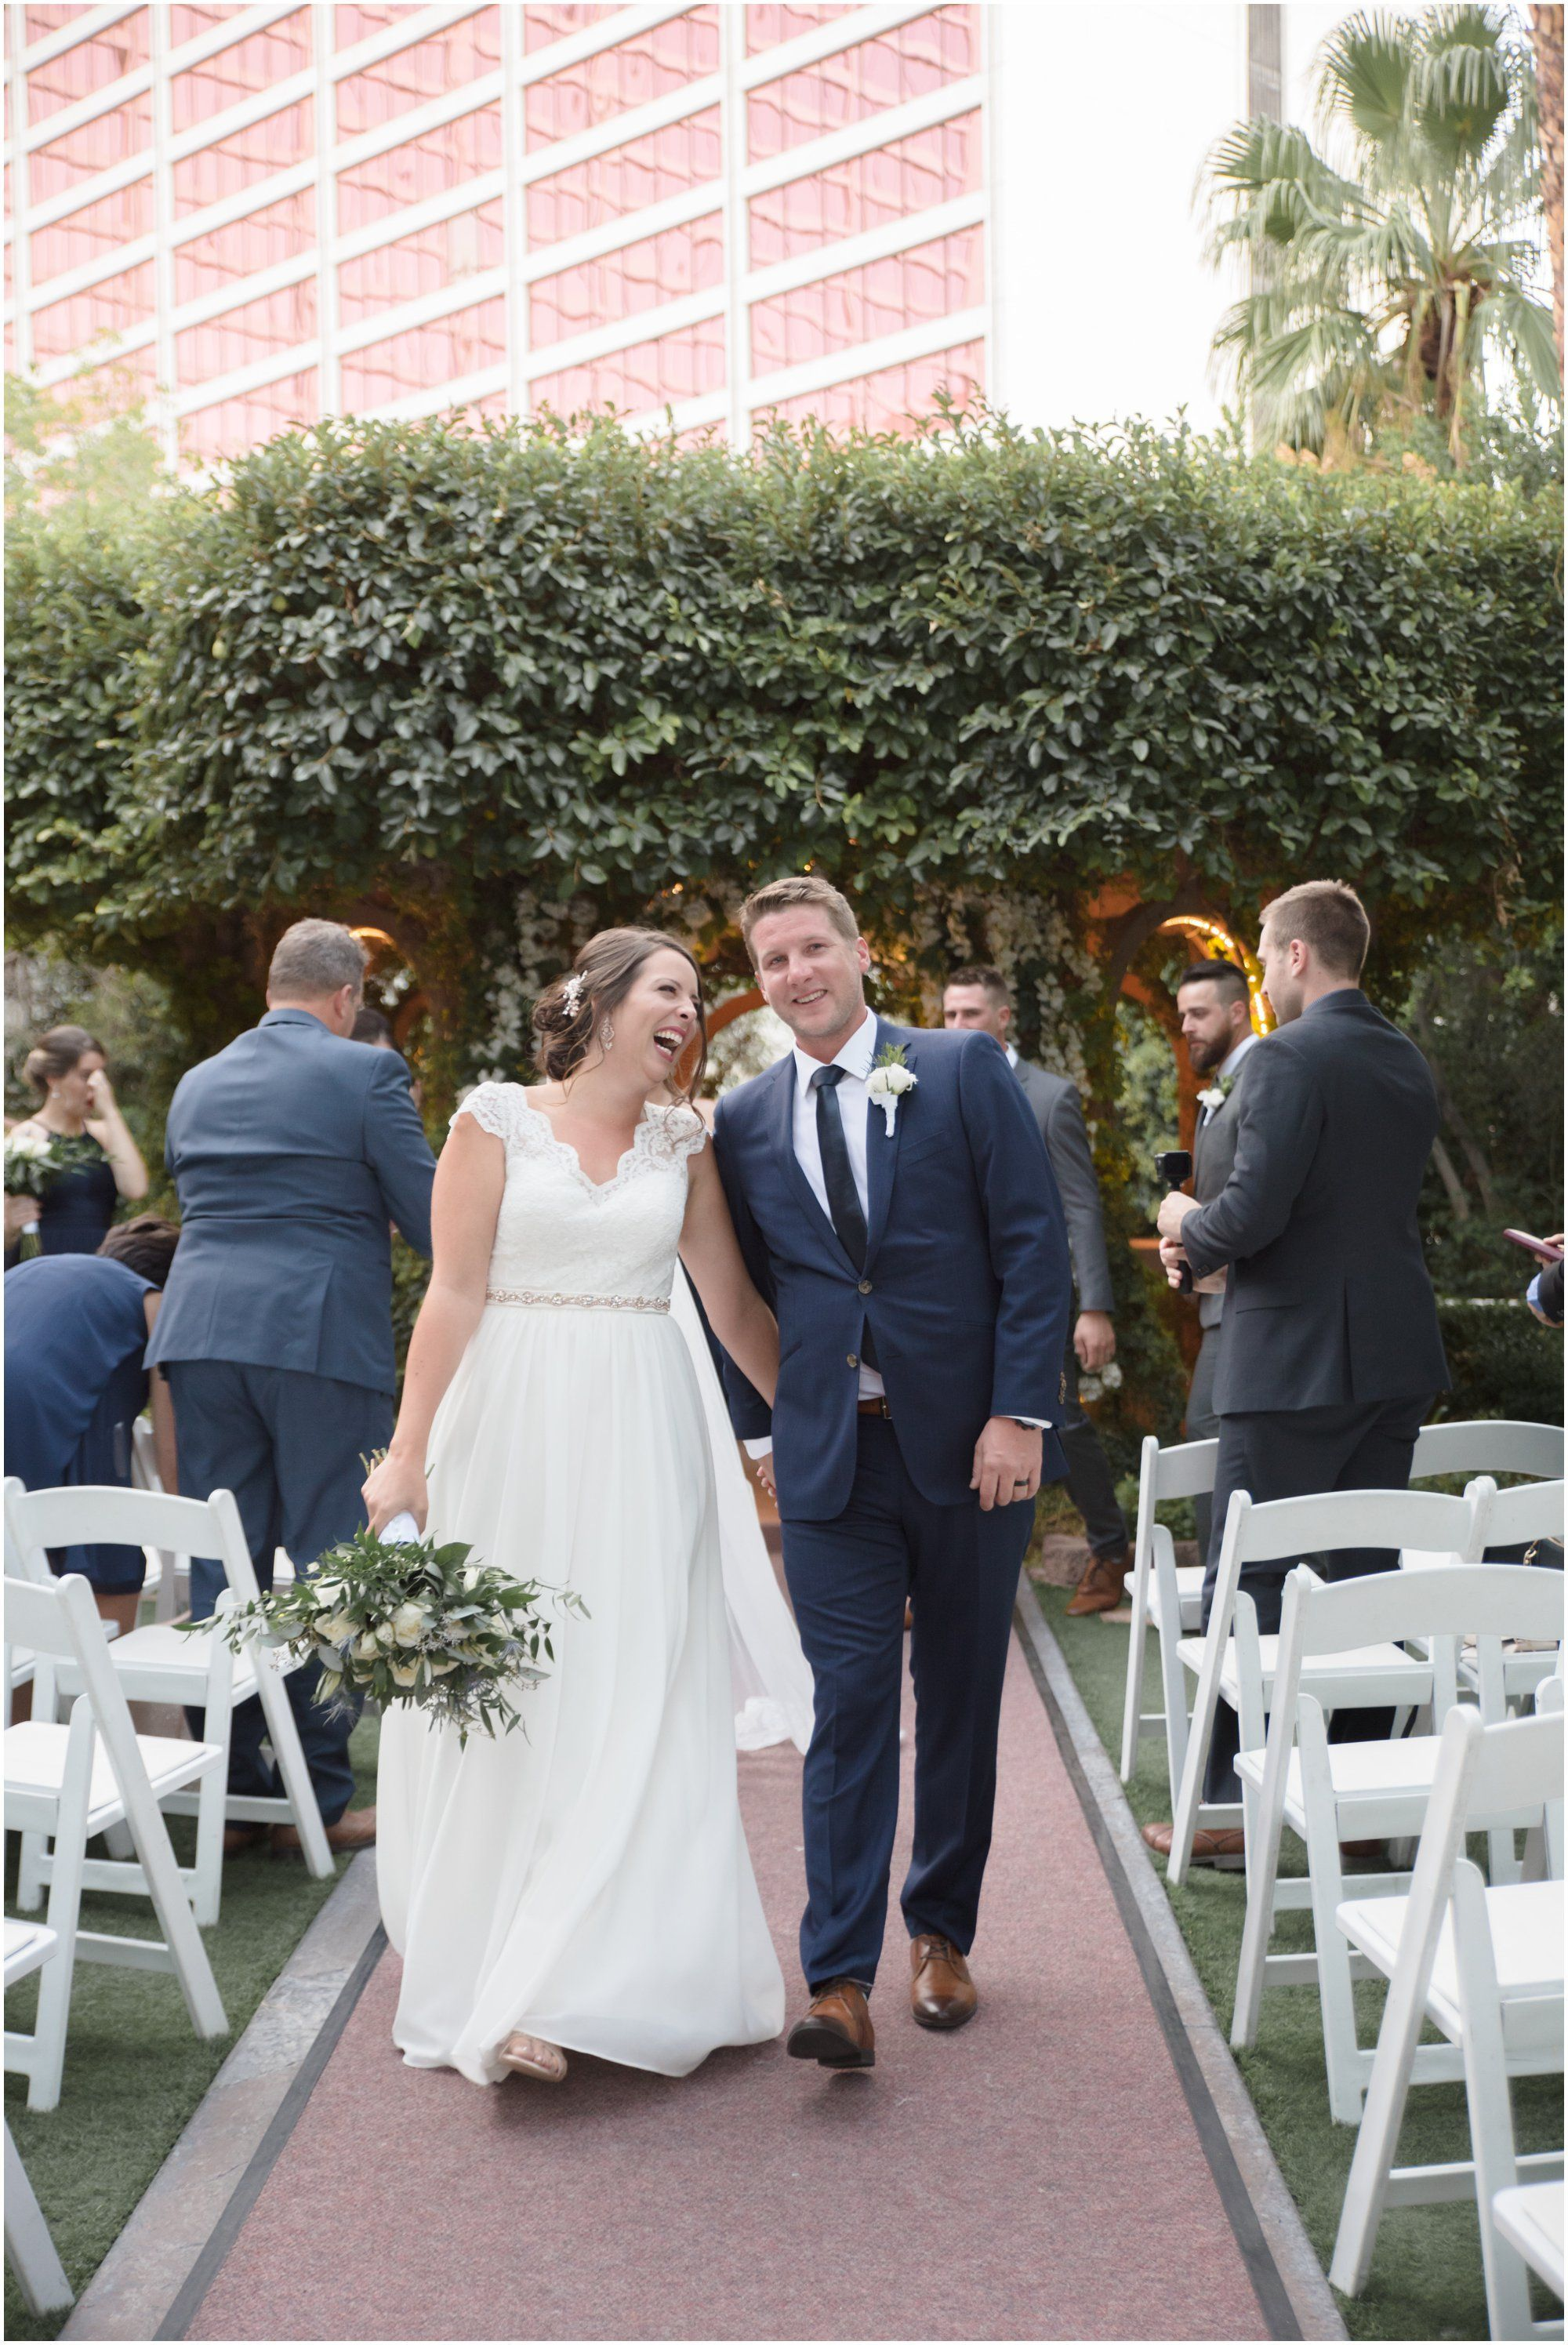 Ariane Rory Wedding At The Flamingo Hotel Casino Las Vegas Wedding Venue Conservative Wedding Dress